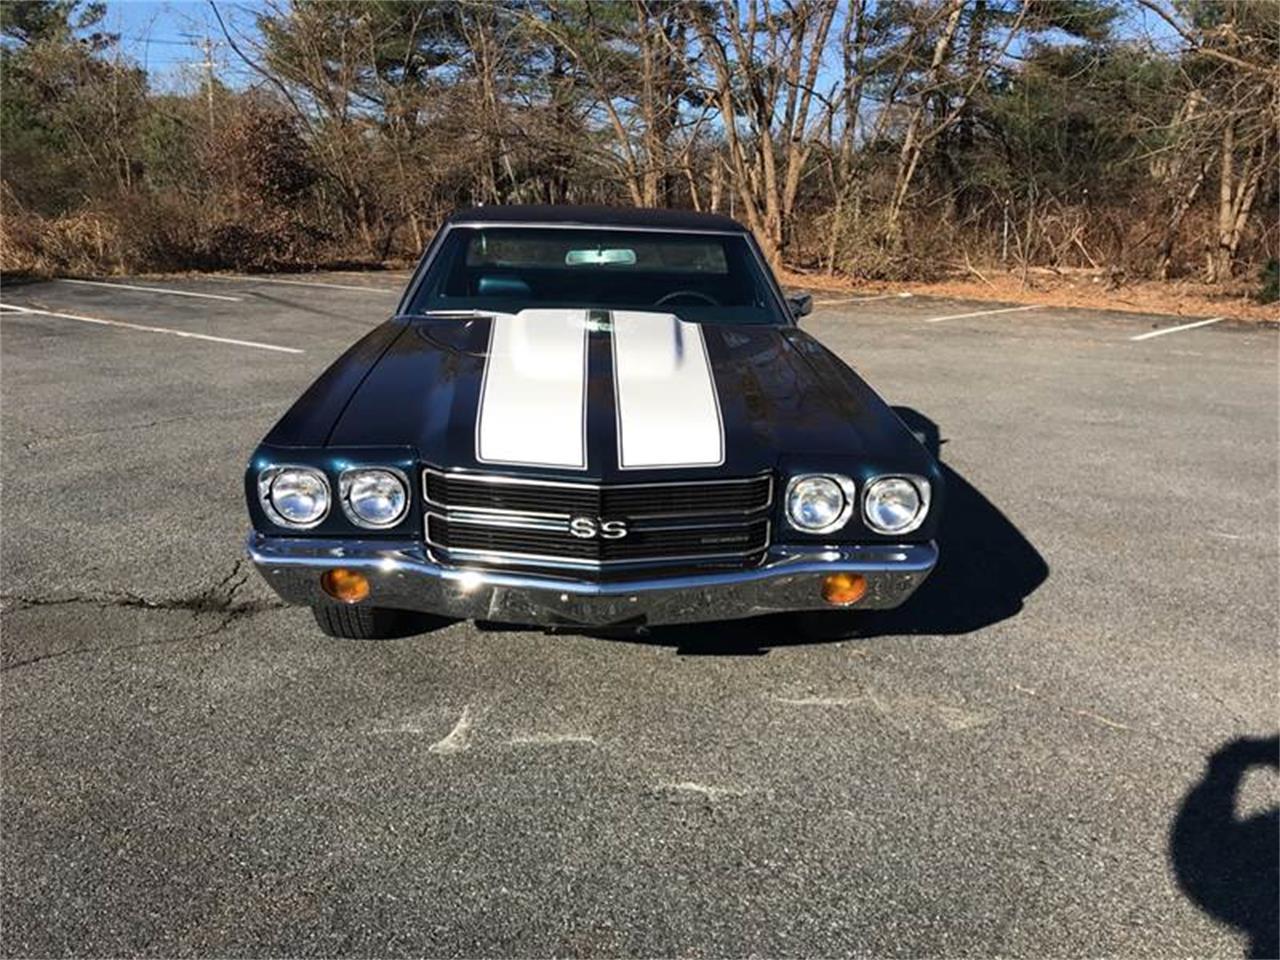 1970 Chevrolet El Camino (CC-1300815) for sale in Westford, Massachusetts